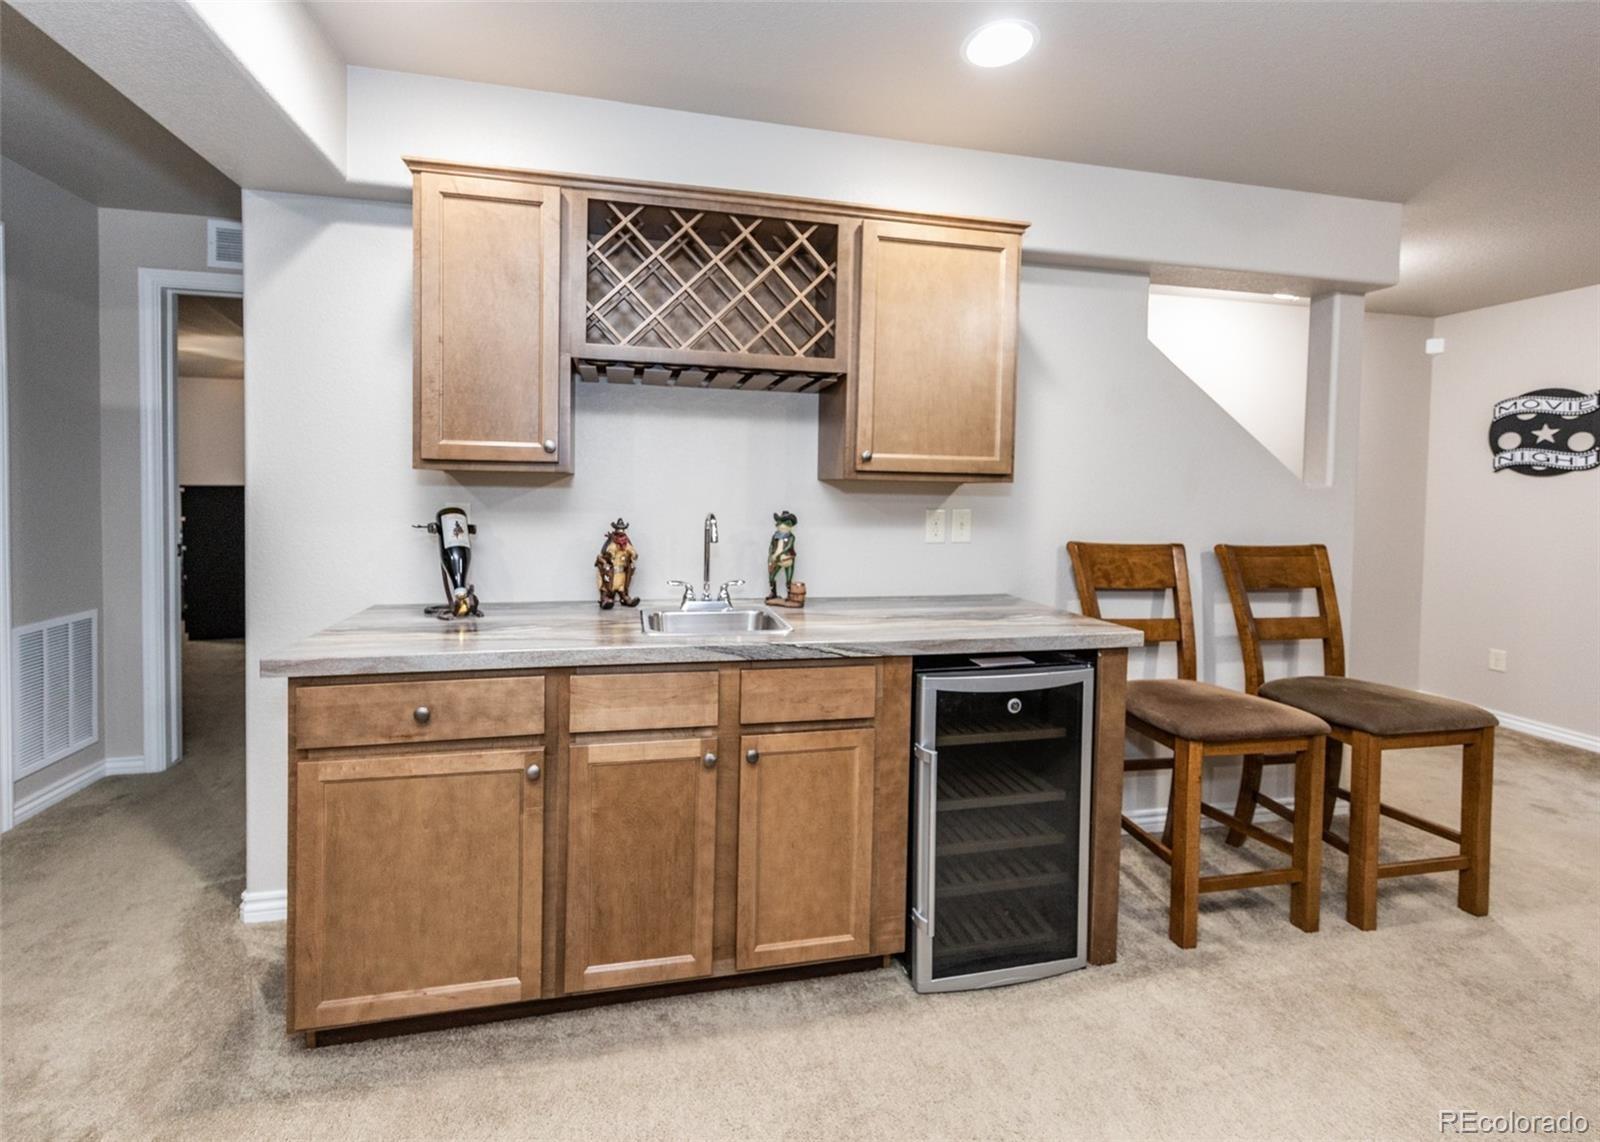 MLS# 2985288 - 24 - 10745 Echo Canyon Drive, Colorado Springs, CO 80908